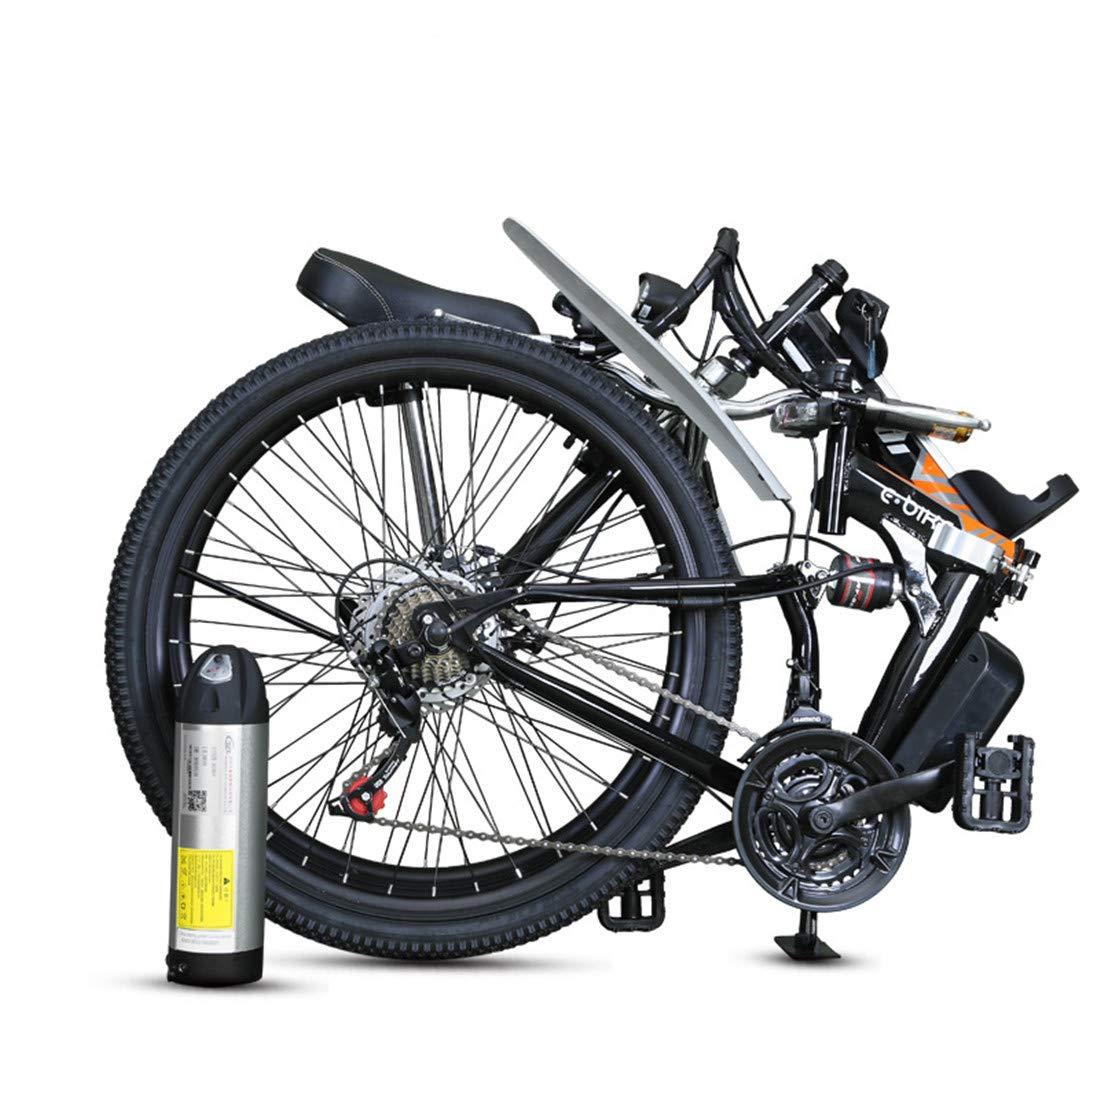 lvbeis erwachsene elektrisches fahrrad faltendes. Black Bedroom Furniture Sets. Home Design Ideas